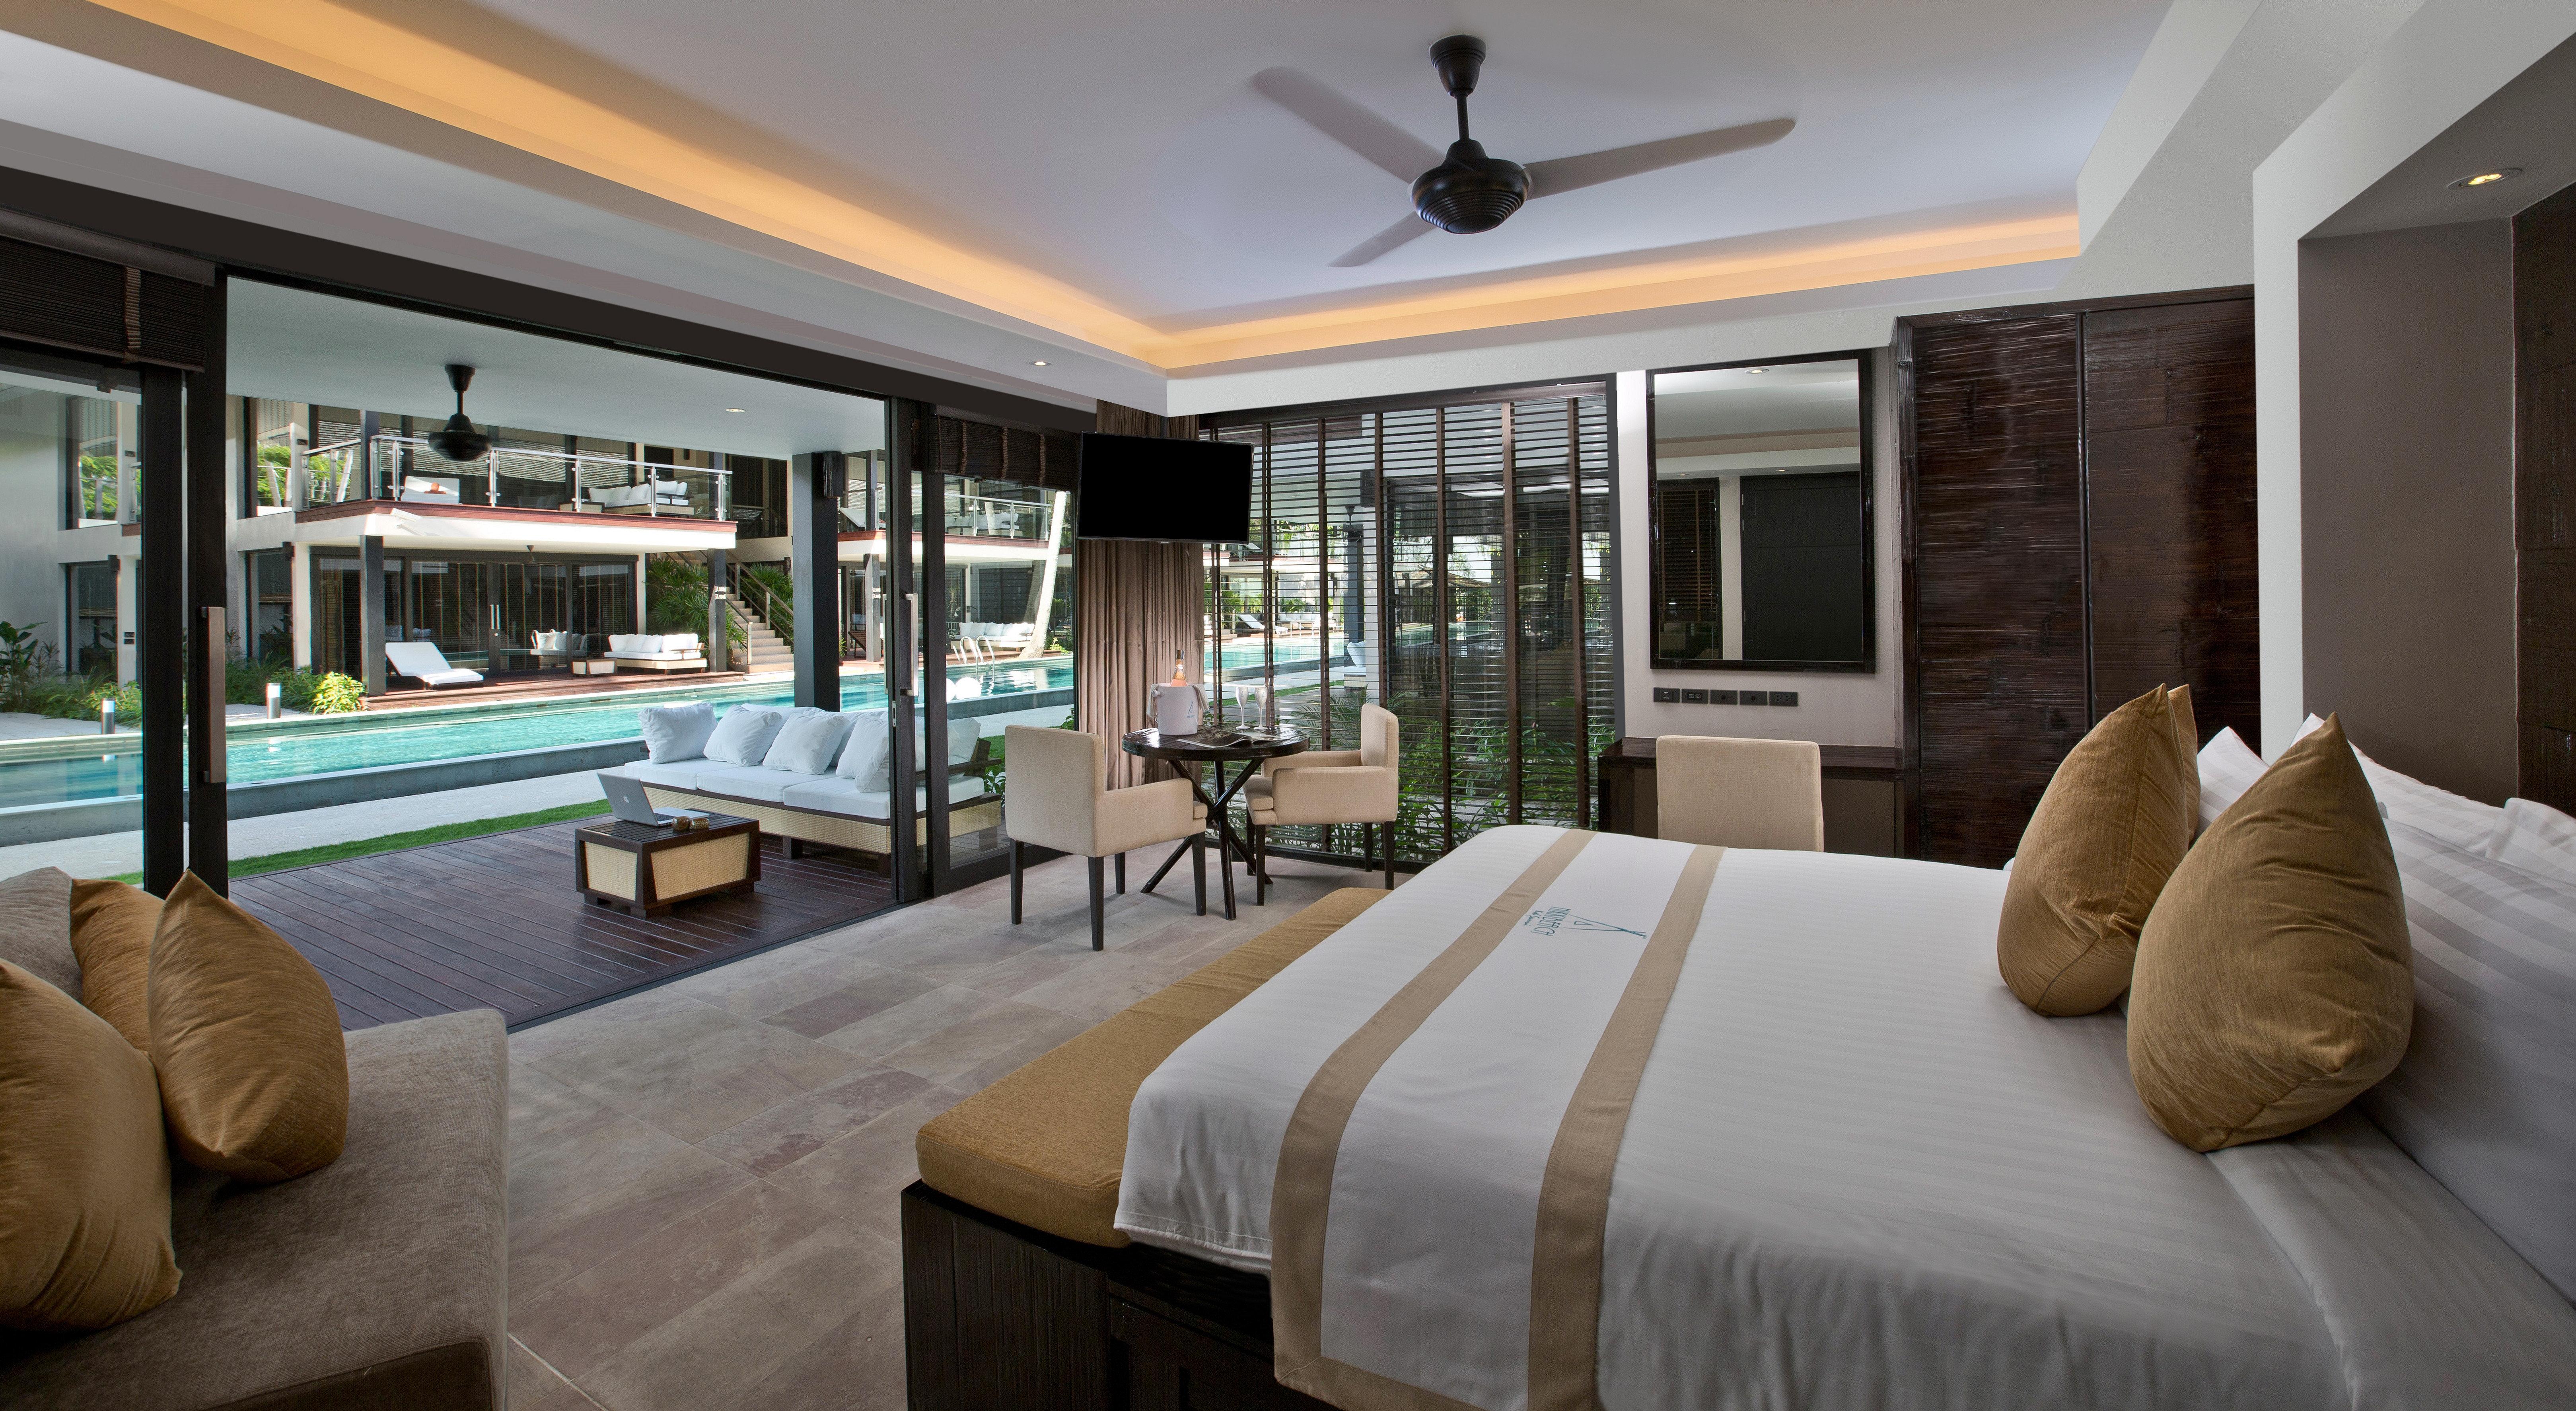 Bedroom Modern Resort Suite sofa property condominium living room home Villa